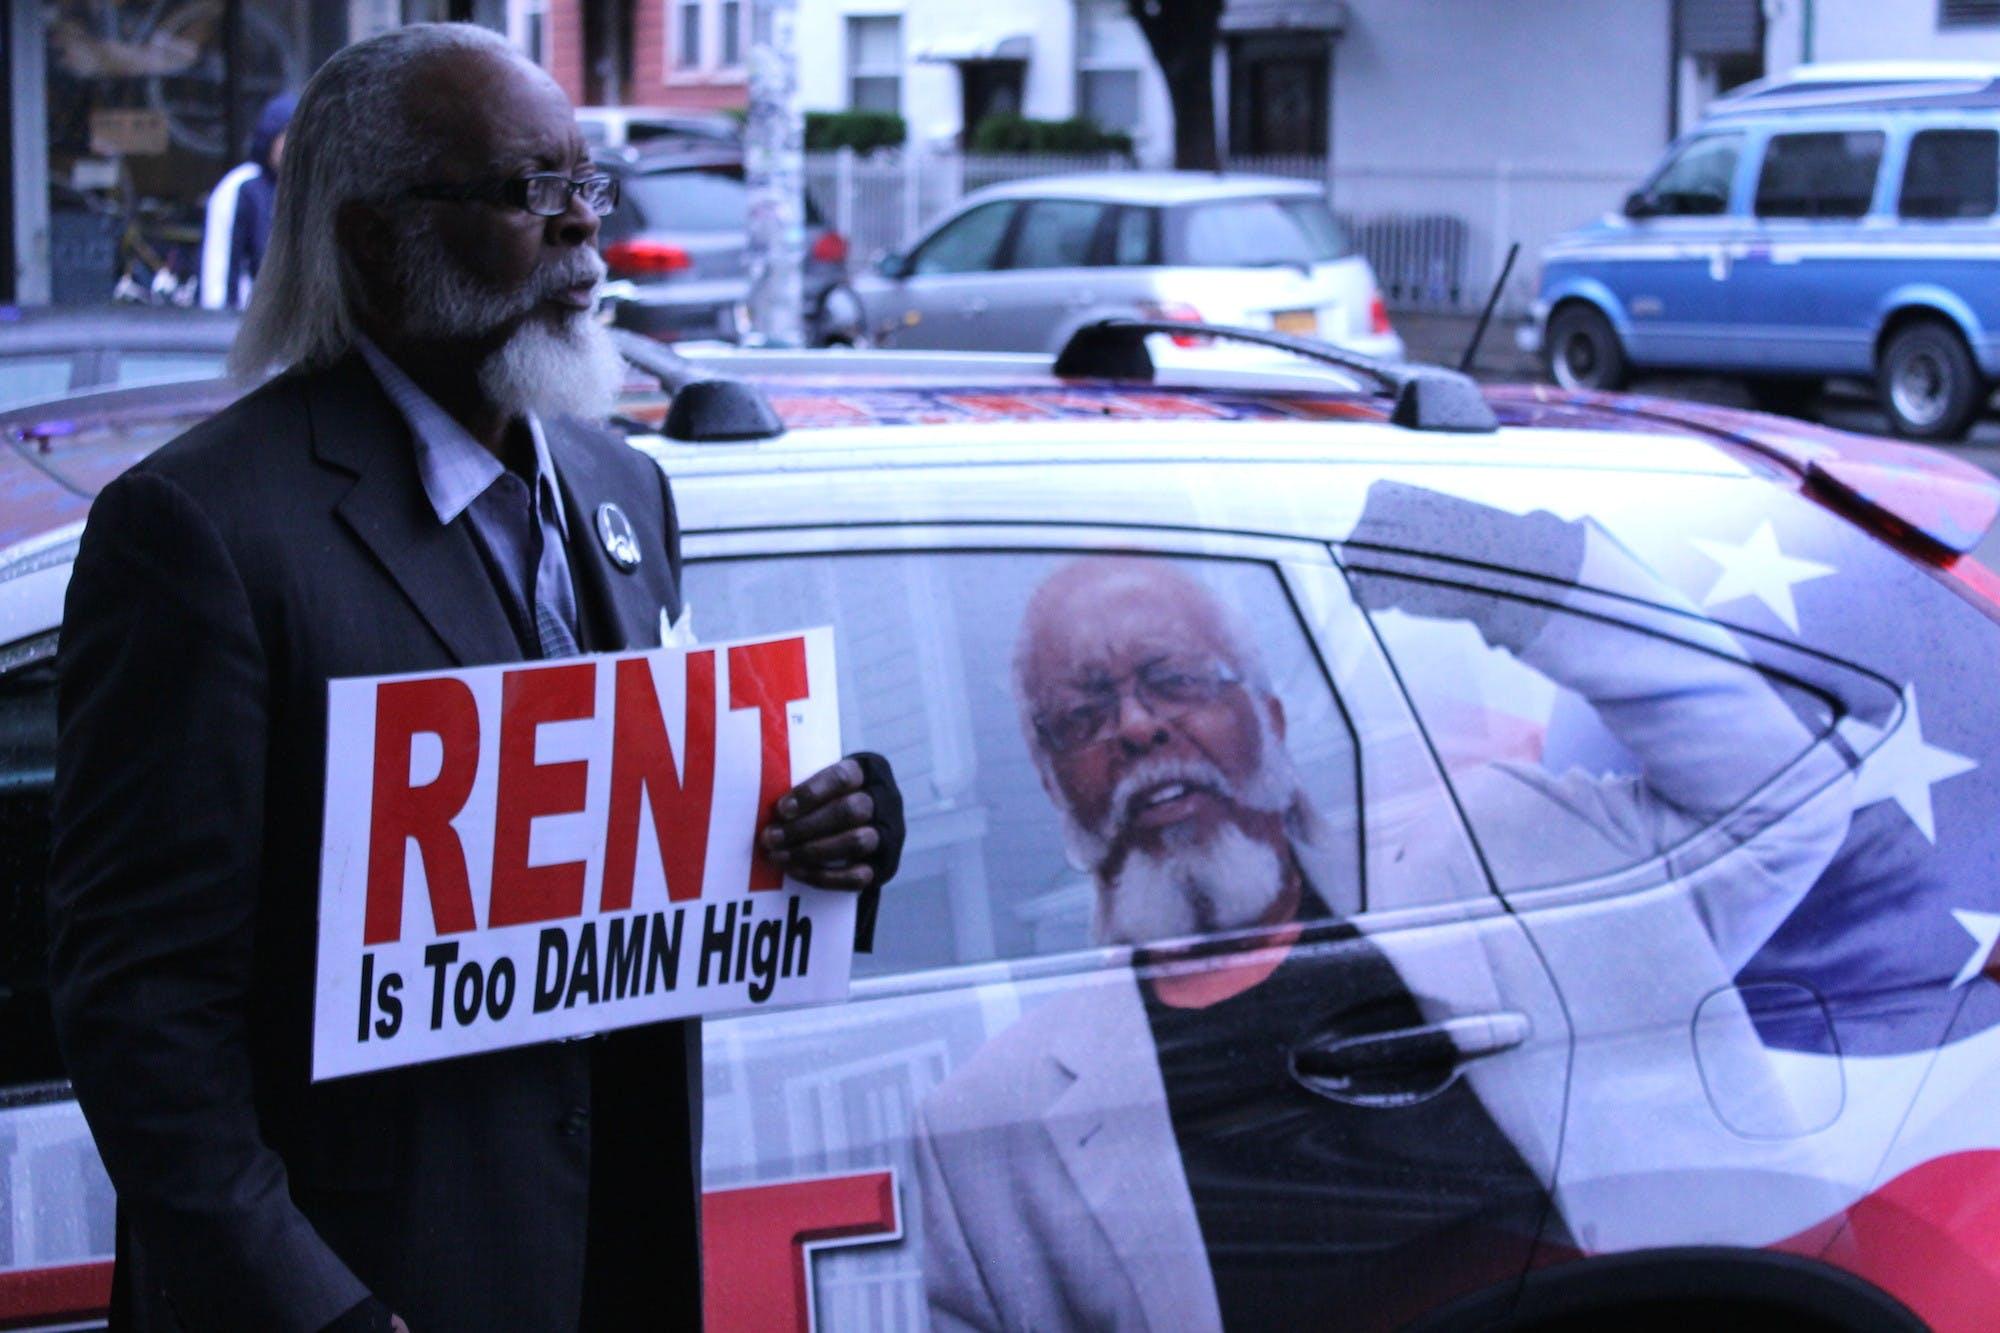 Rent is too damn high guy